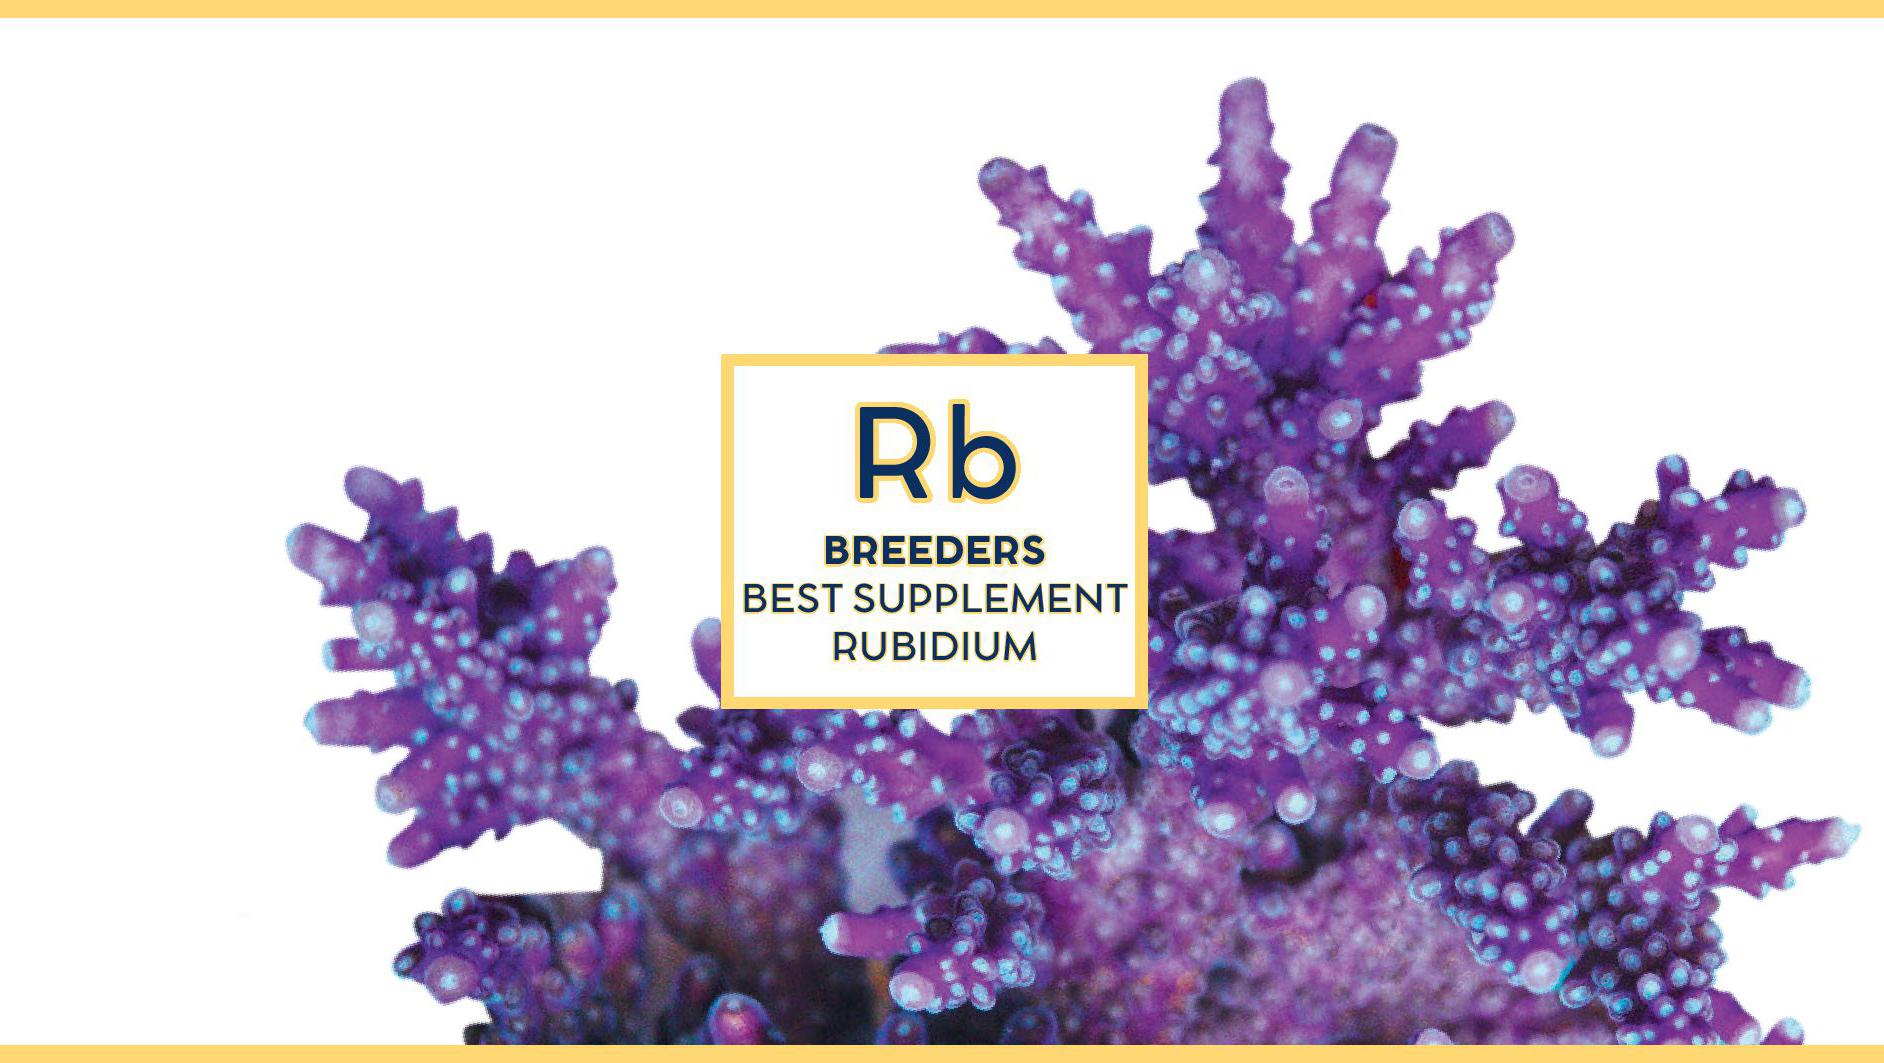 Swiss rainbow Reef Breeders Rubidium